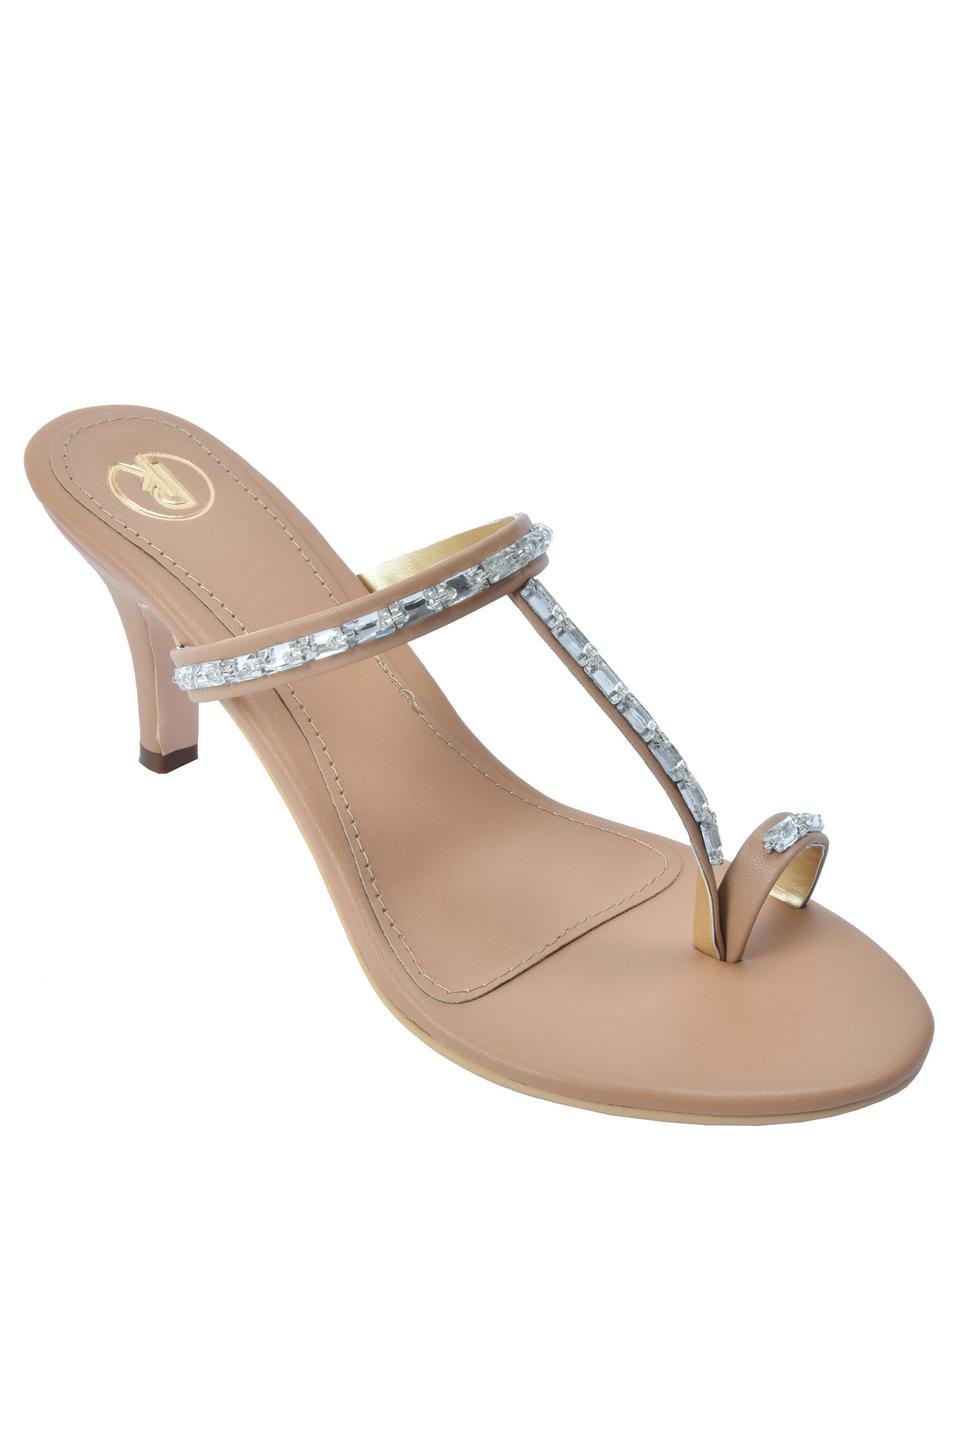 Embellished Cone Heels